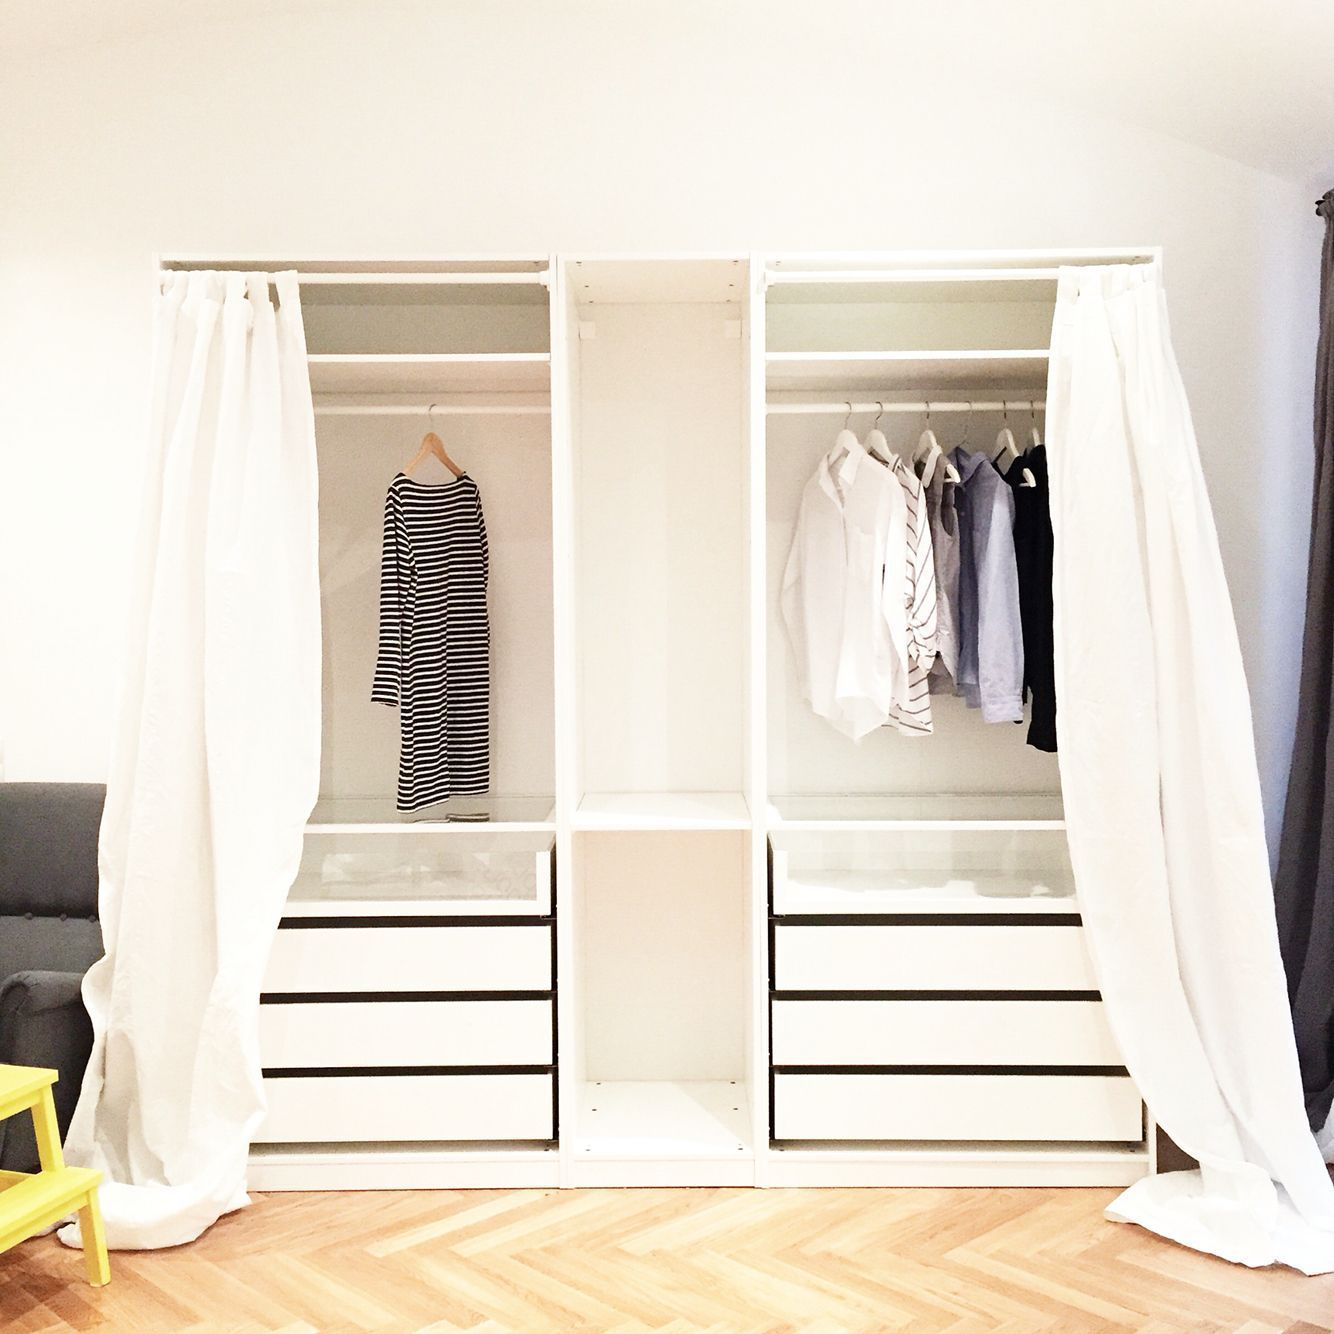 53 The Best Design An Organised Open Wardrobe Idee Chambre Dressing Ikea